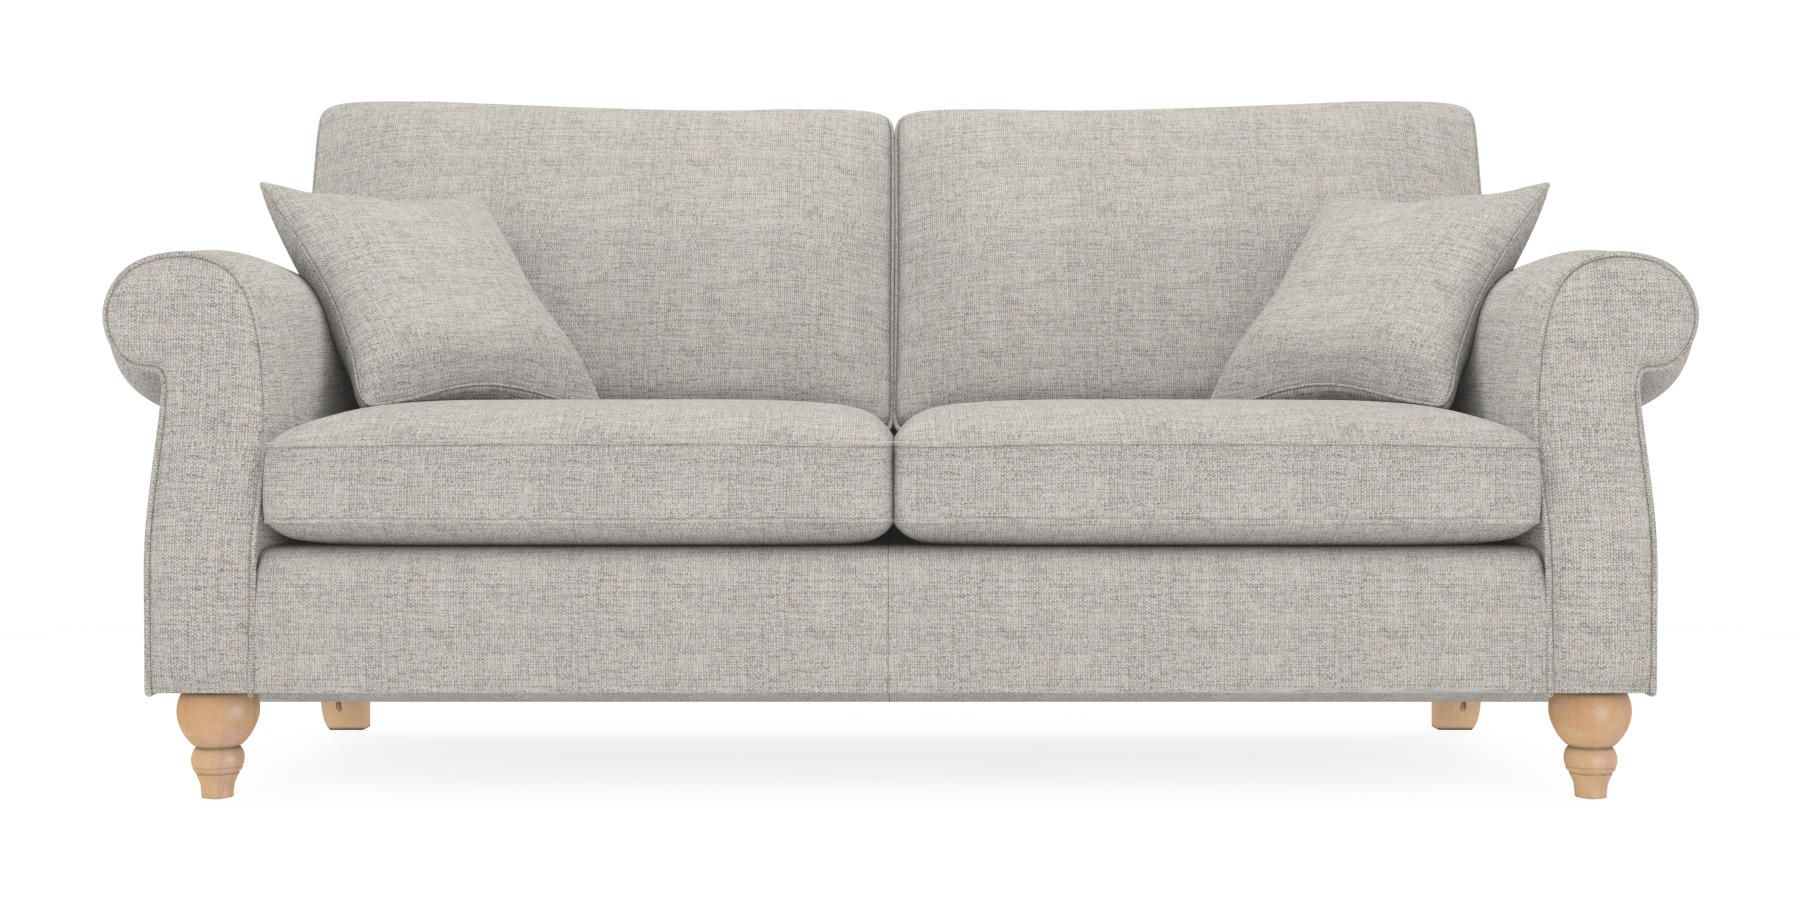 Buy Ashford Large Sofa (3 Seats) Textured Weave Light Grey LowTurned ...